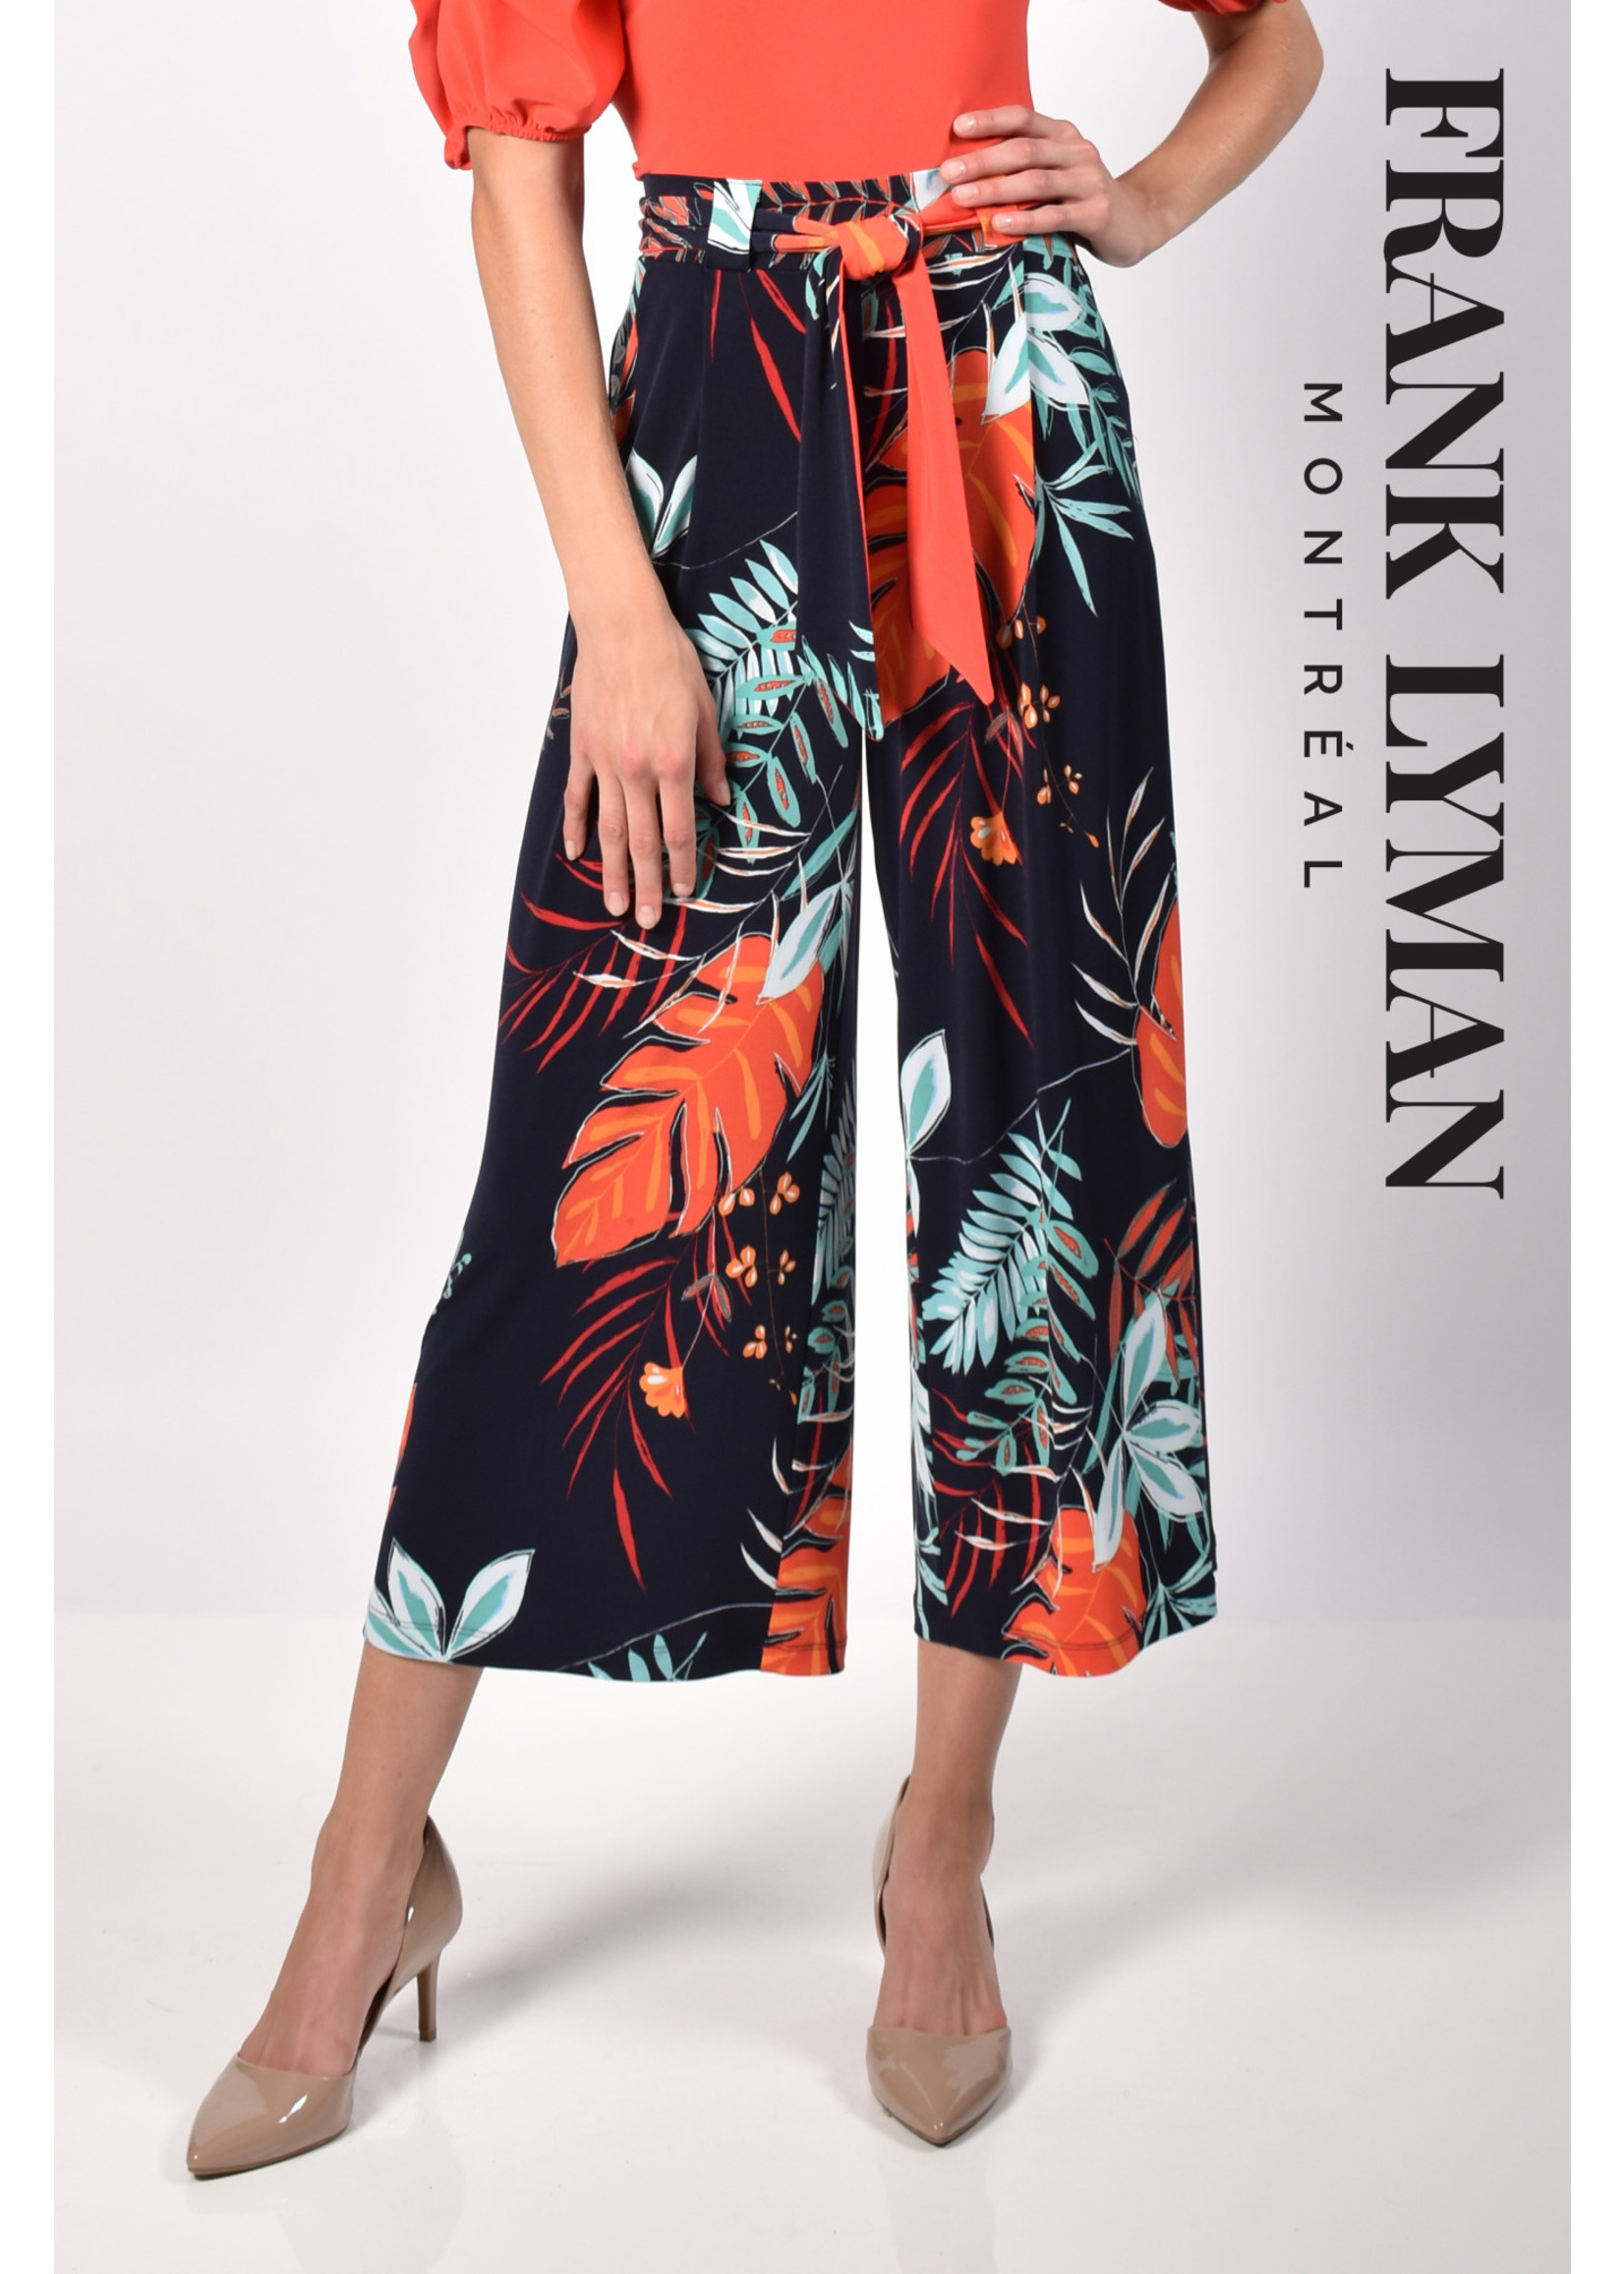 Frank Lyman Navy/Orange Knit Culottes